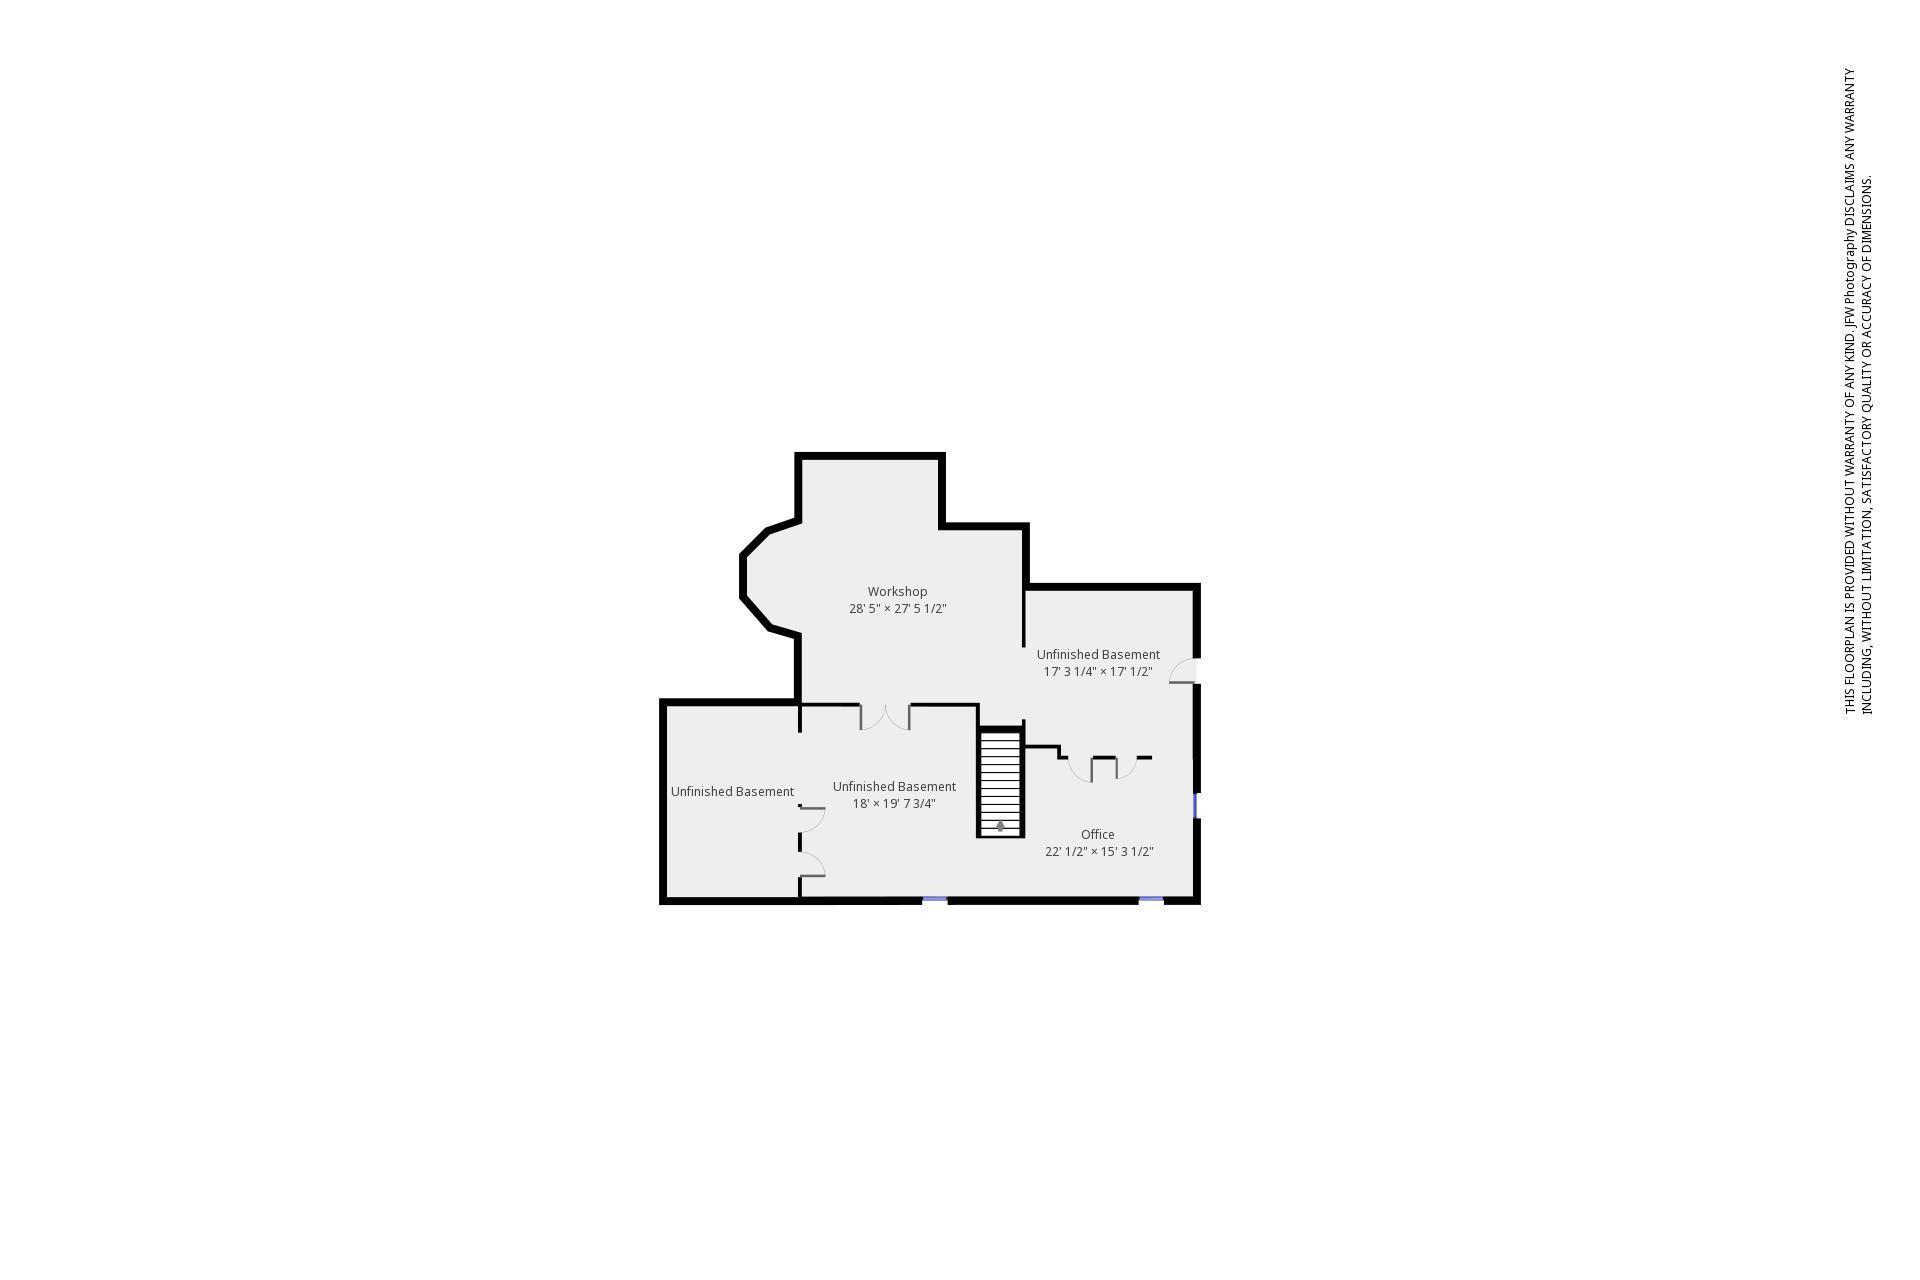 634 main street brewster ma 02631 property image 53